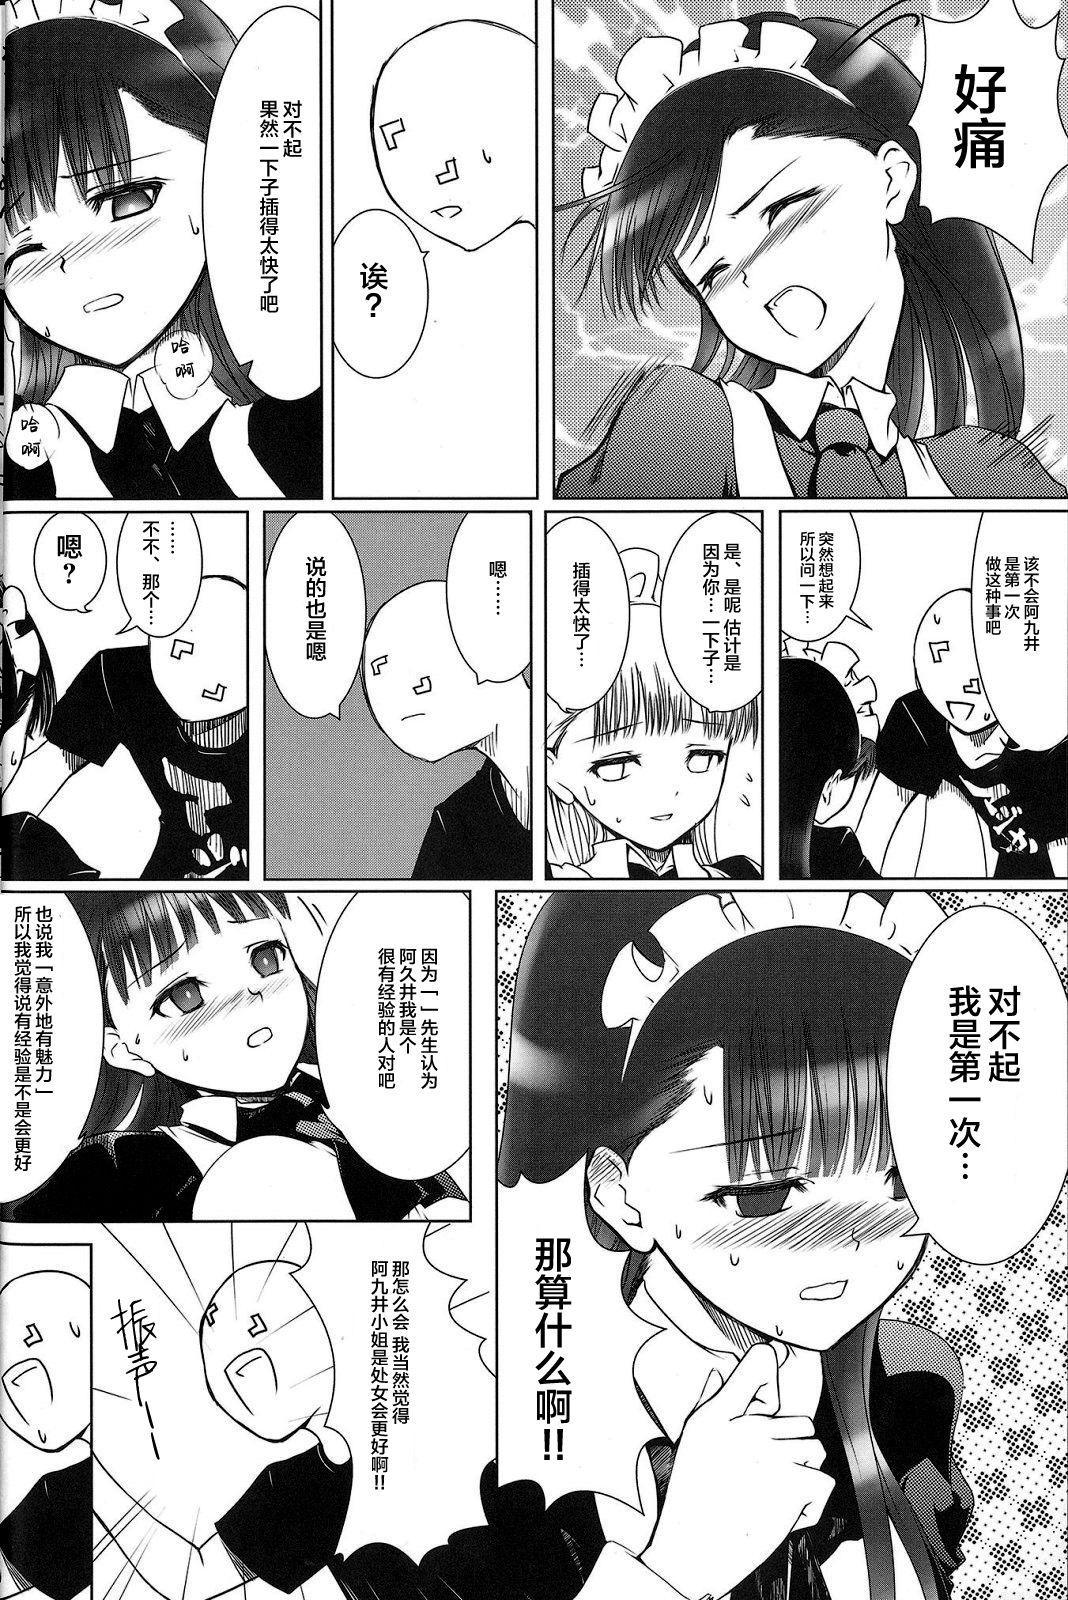 [Heikoushihenkei (Kawanakajima)] Akui-san ga Kaze hi-ta 1 [Chinese] [lolipoi汉化组] [2014-06-10] 17